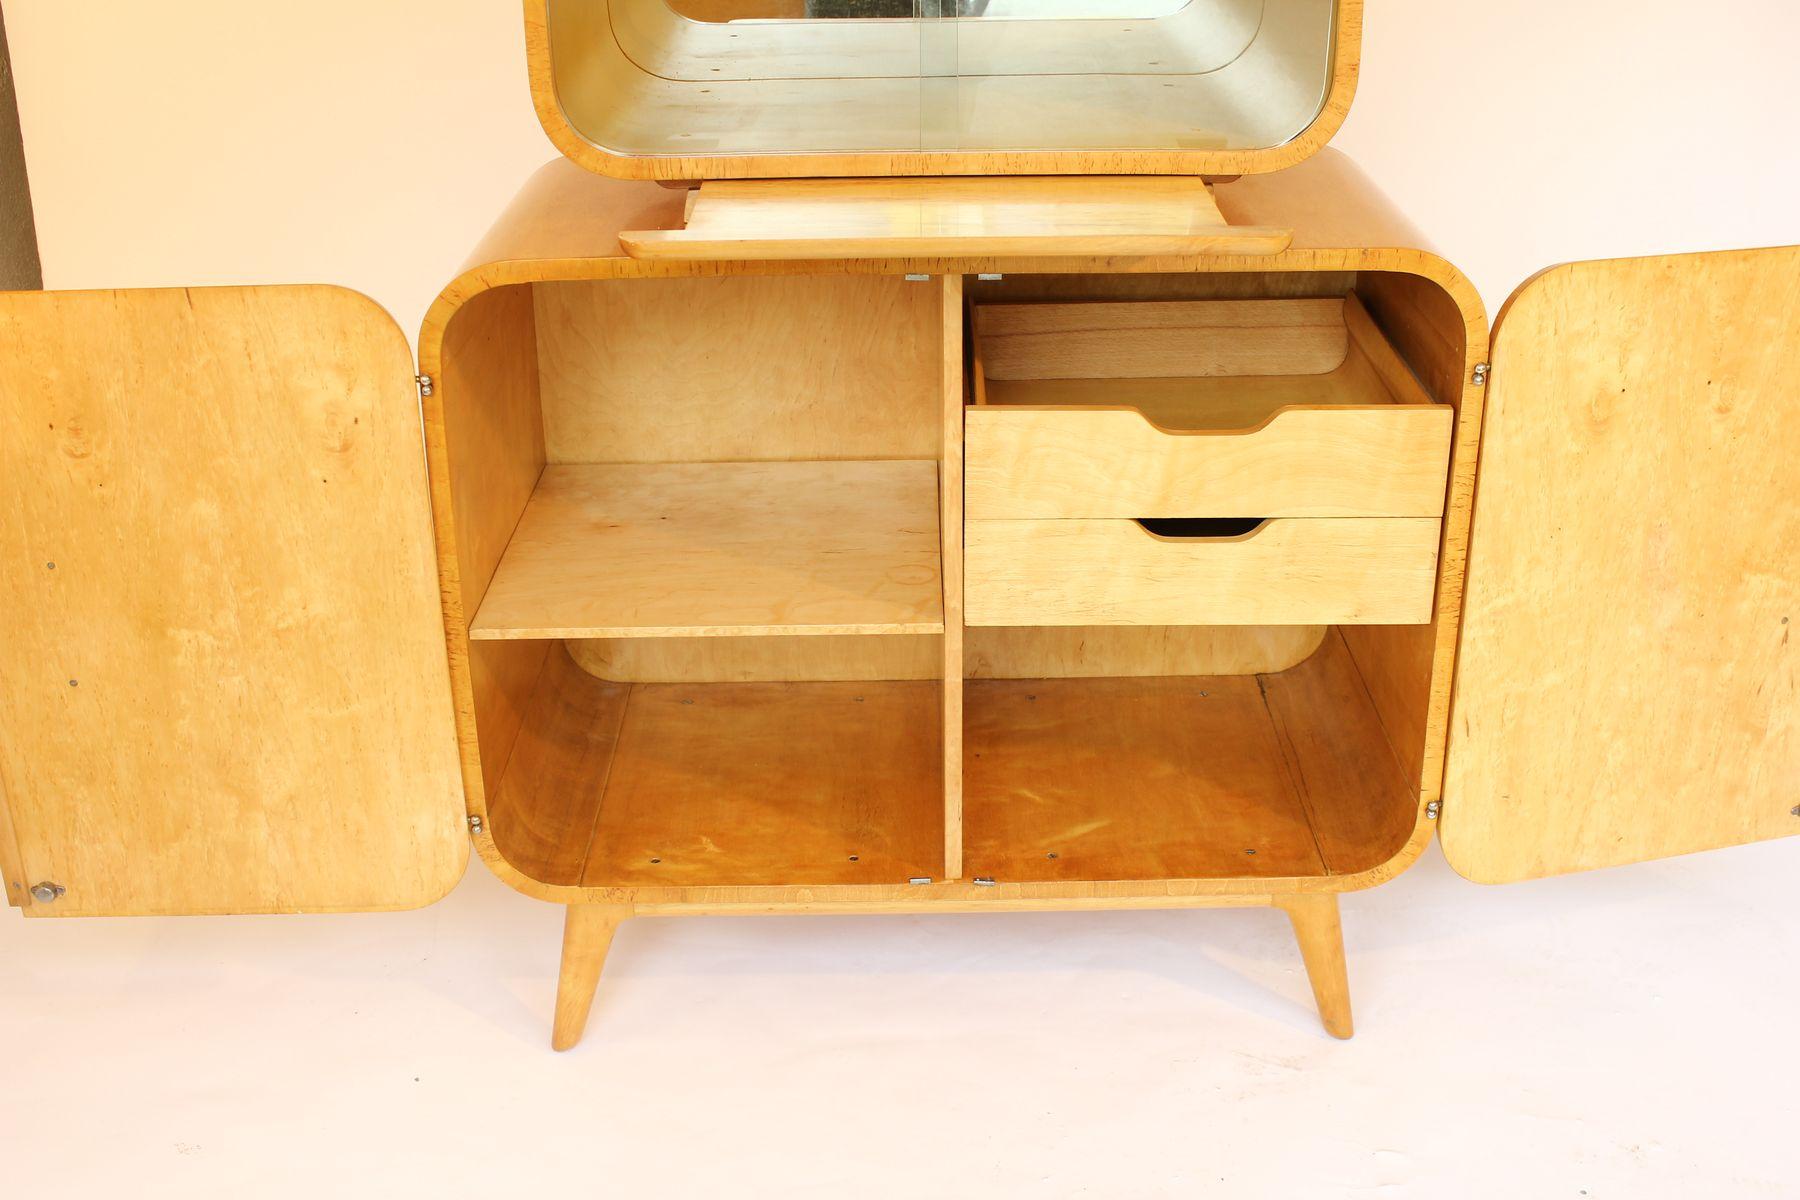 Poplar For Cabinets Poplar Veneer Cabinet By Jindrich Halabala For Up Zavody Brno